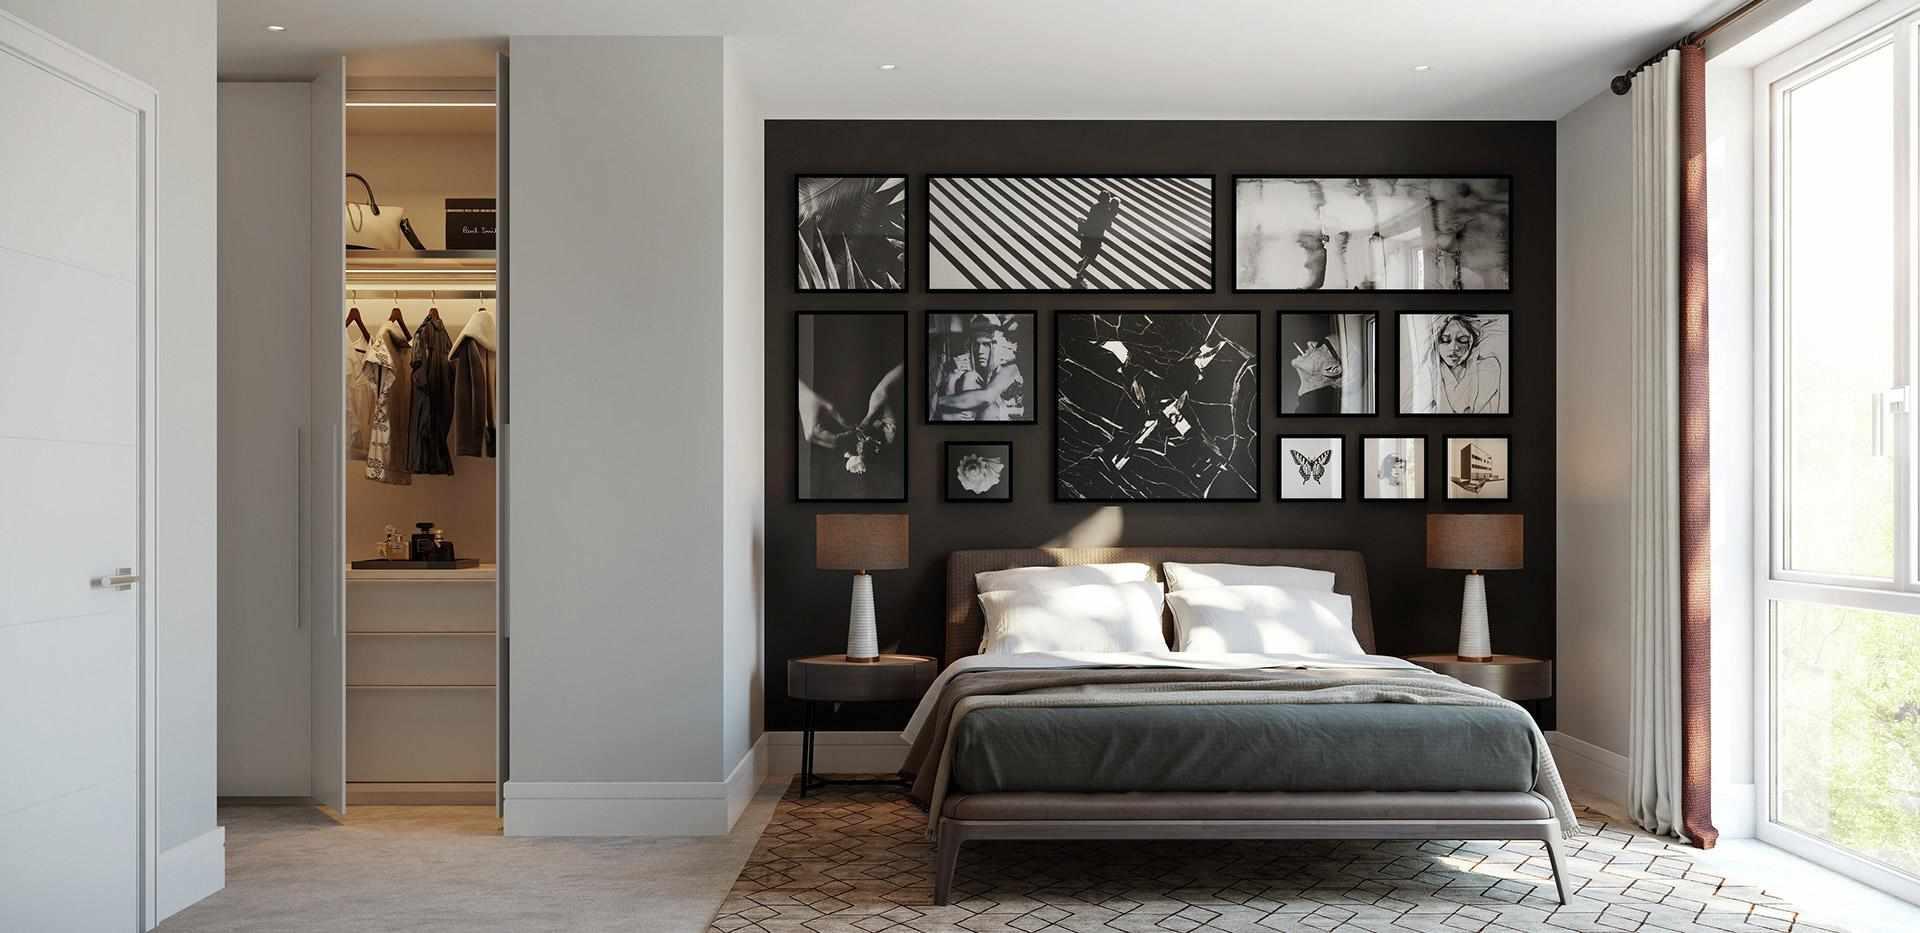 Forbury Apartments - CGI - 5.jpeg